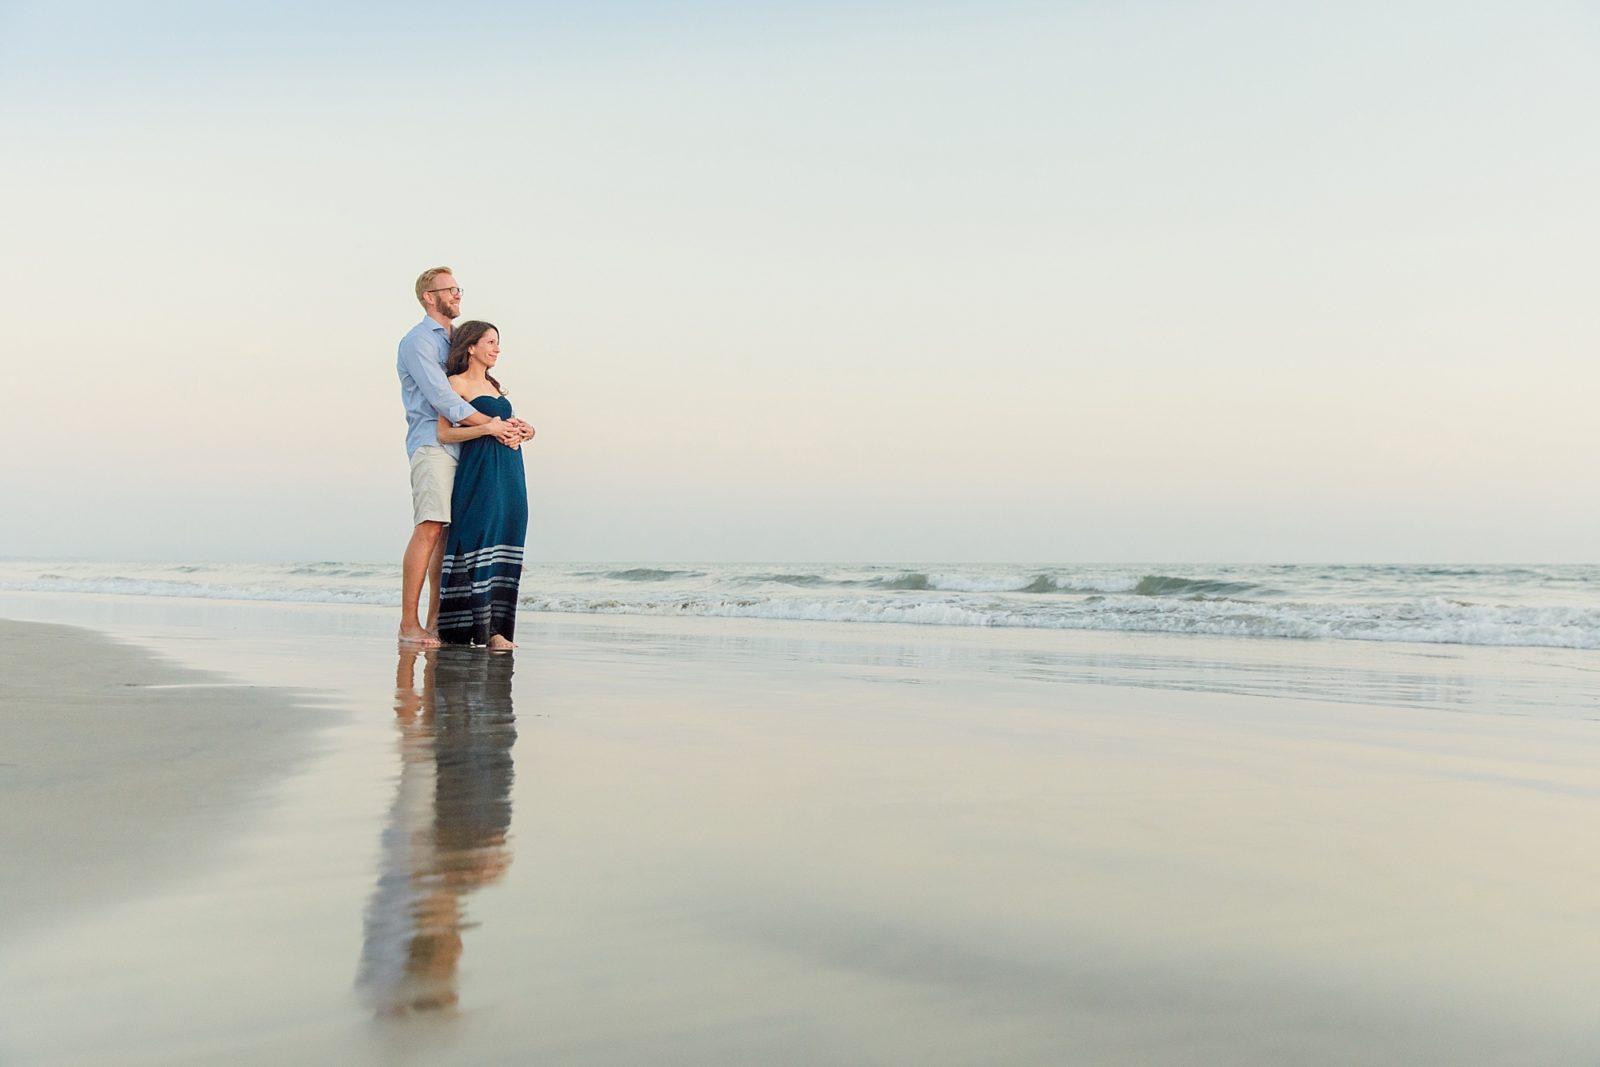 San Diego Beach Photographer | Hotel del Coronado Photographer